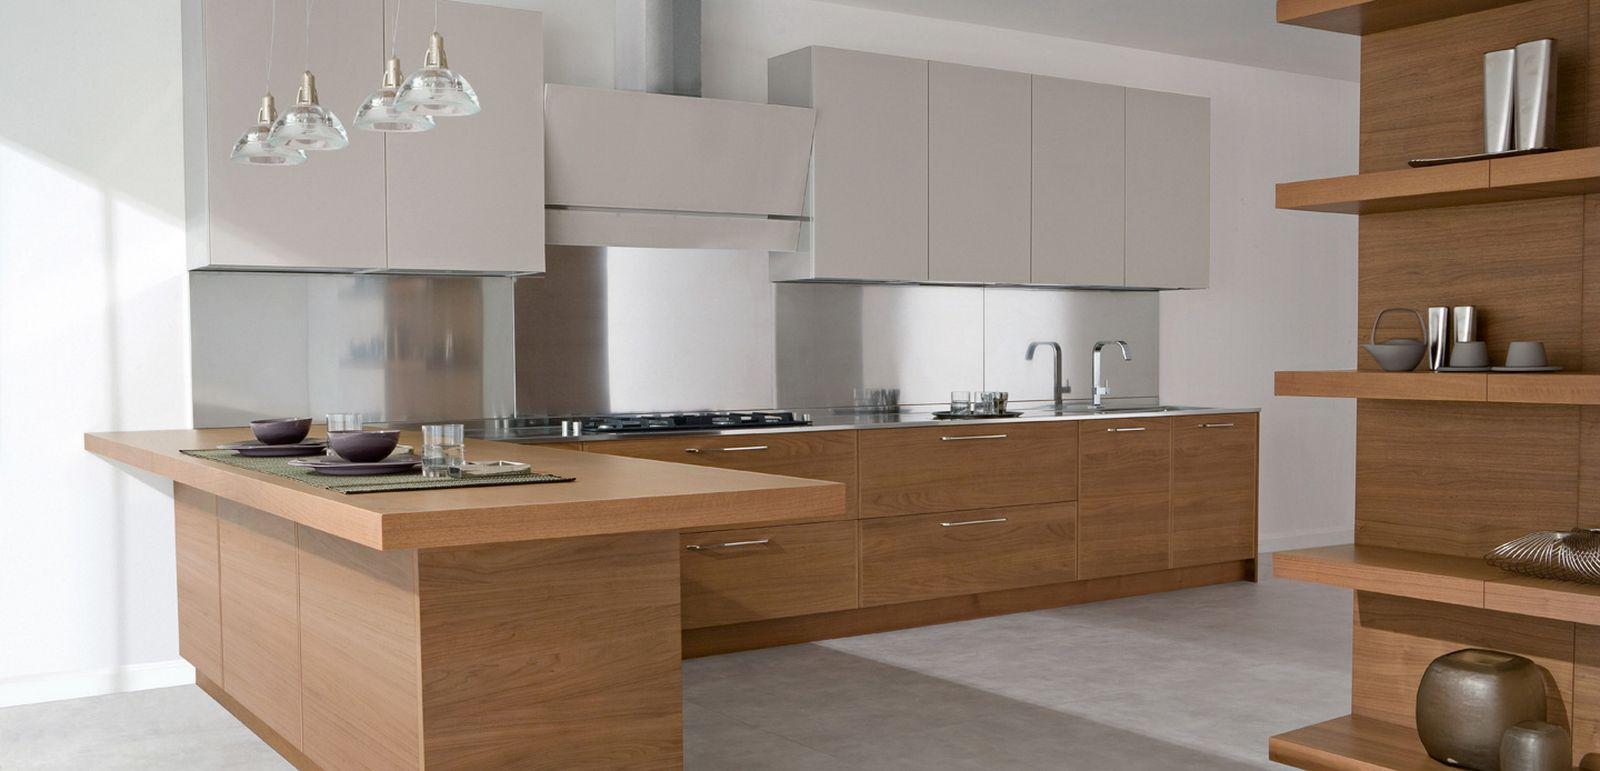 Basics Of Kitchen Interior Part 1 My Decorative